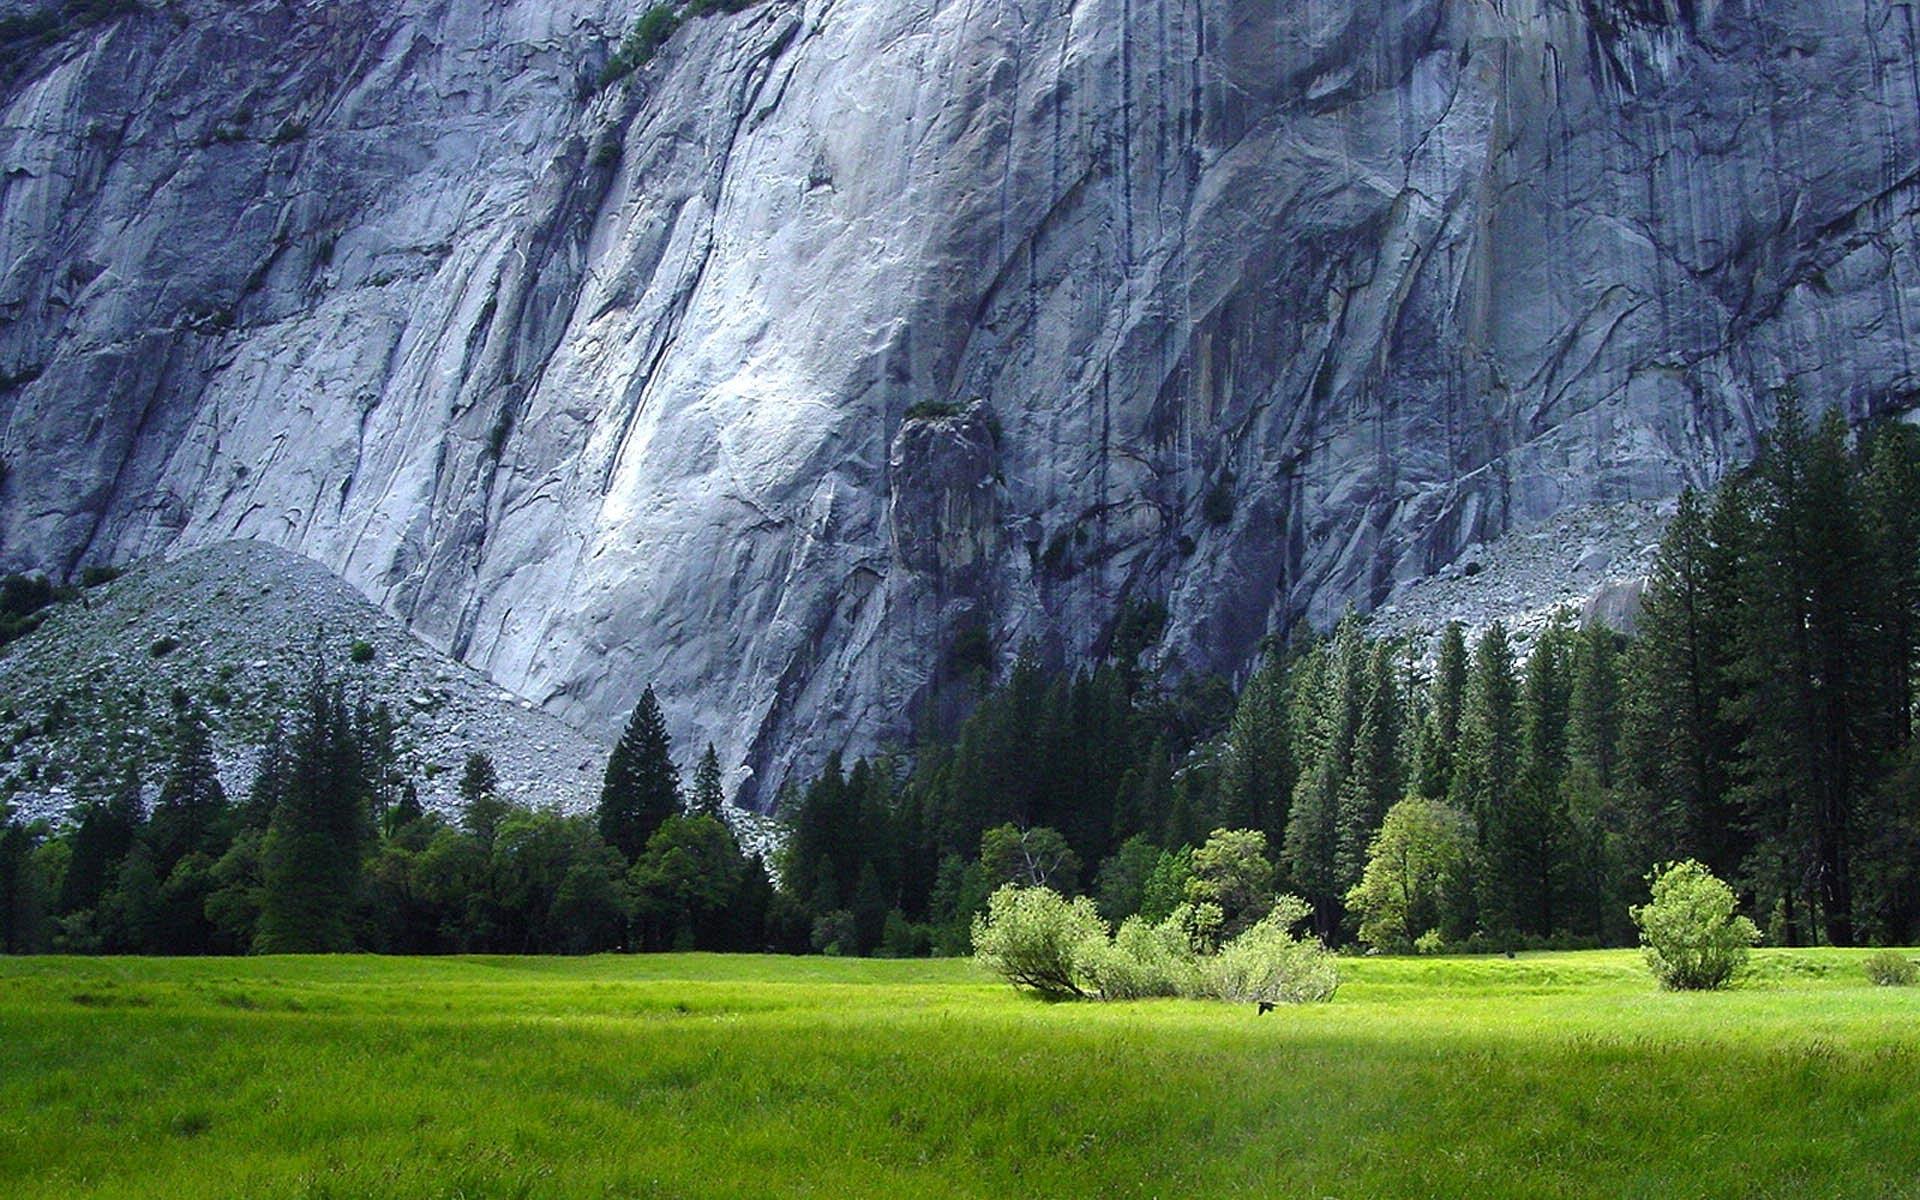 House Cliff Wallpaper Mountain Paper Nature Desktop 1920x1200px